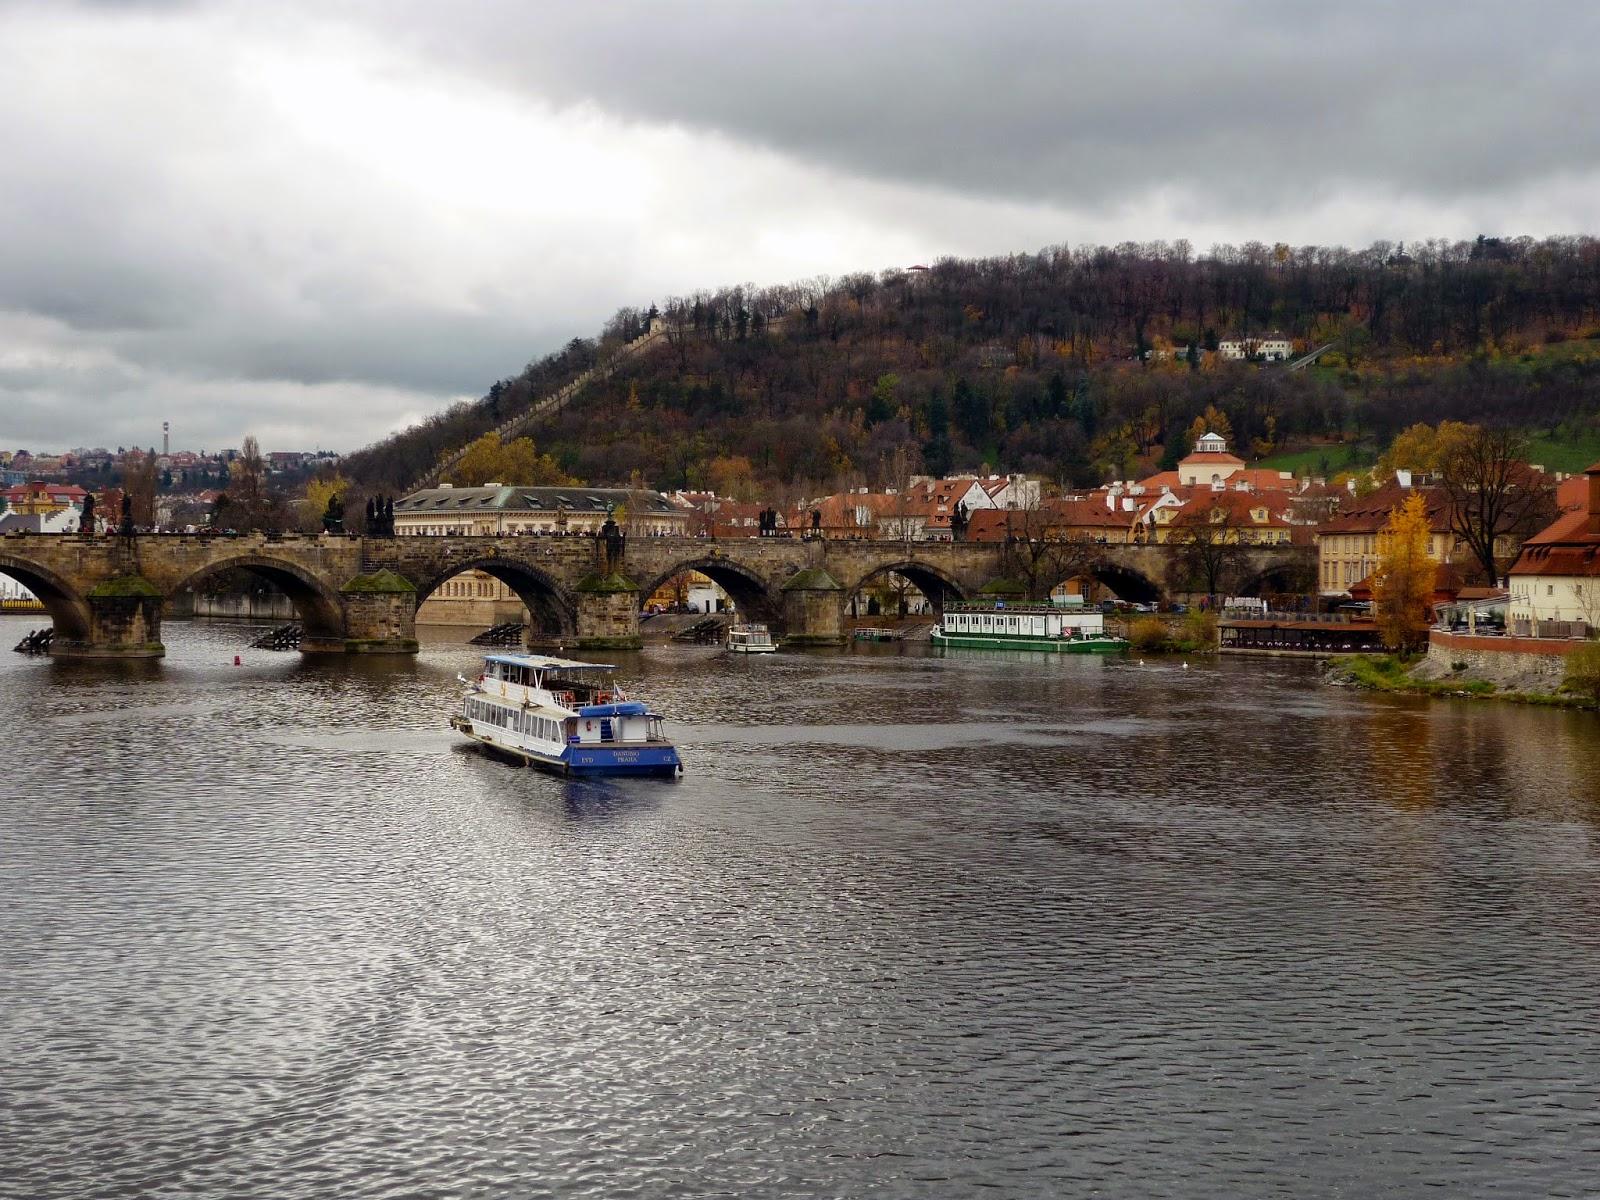 Carl's Bridge in Autumn by Igor L.